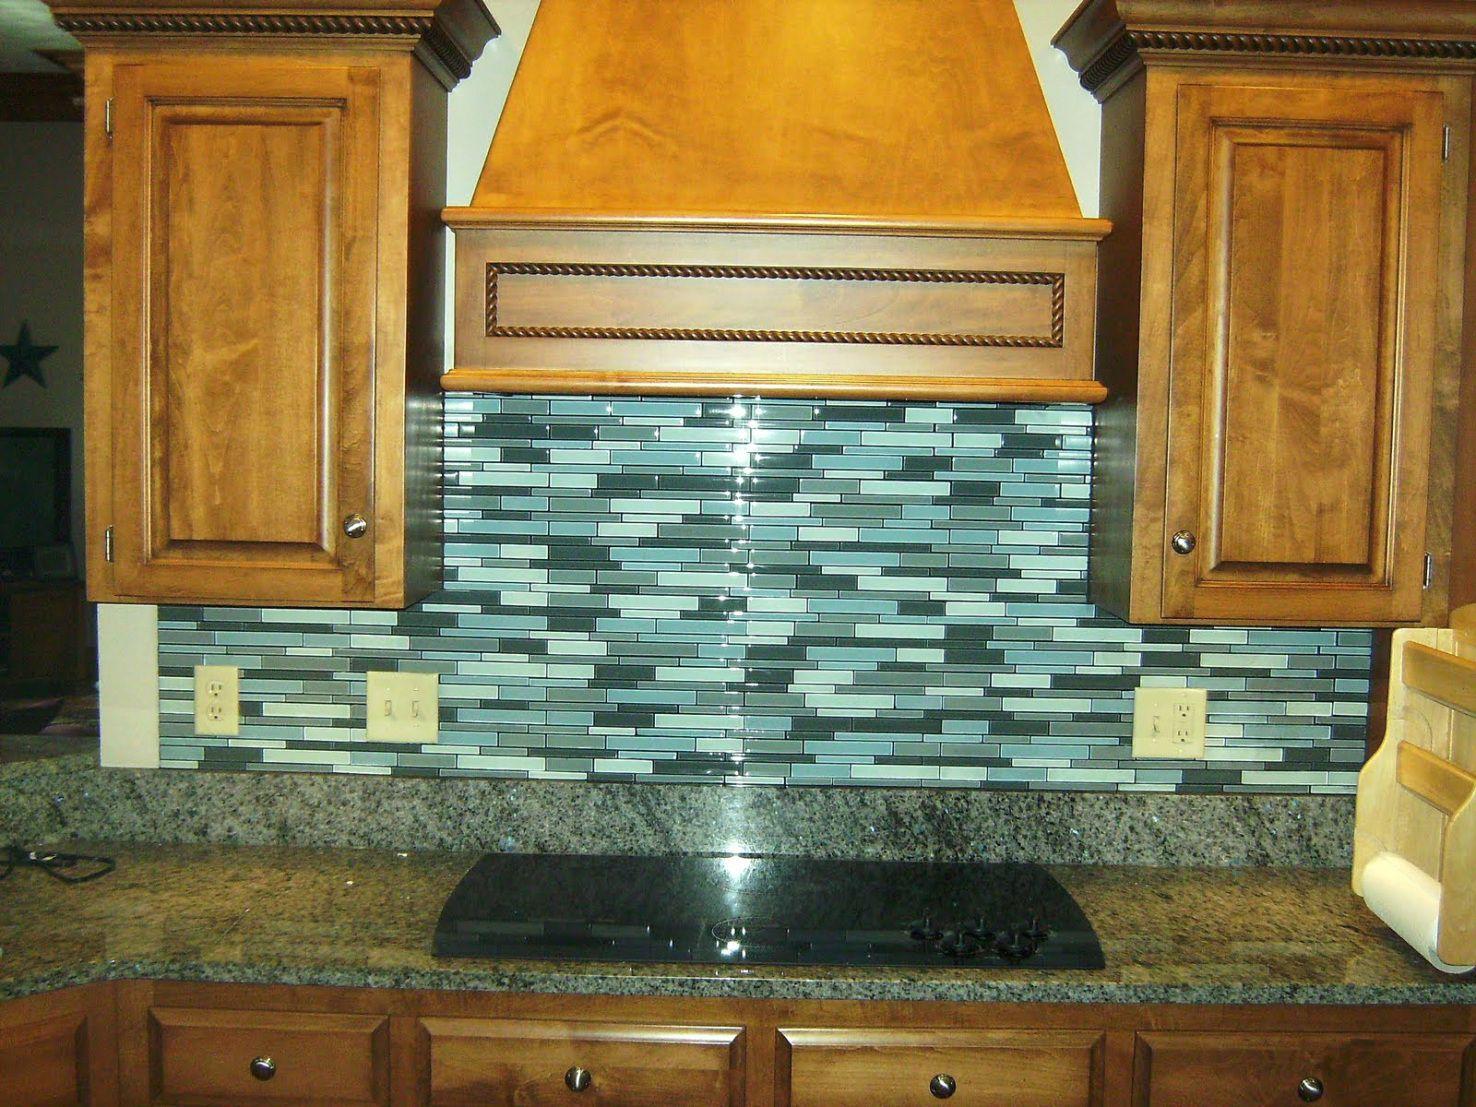 Awesome Granite Countertops With Glass Tile Backsplash Inspiration ...